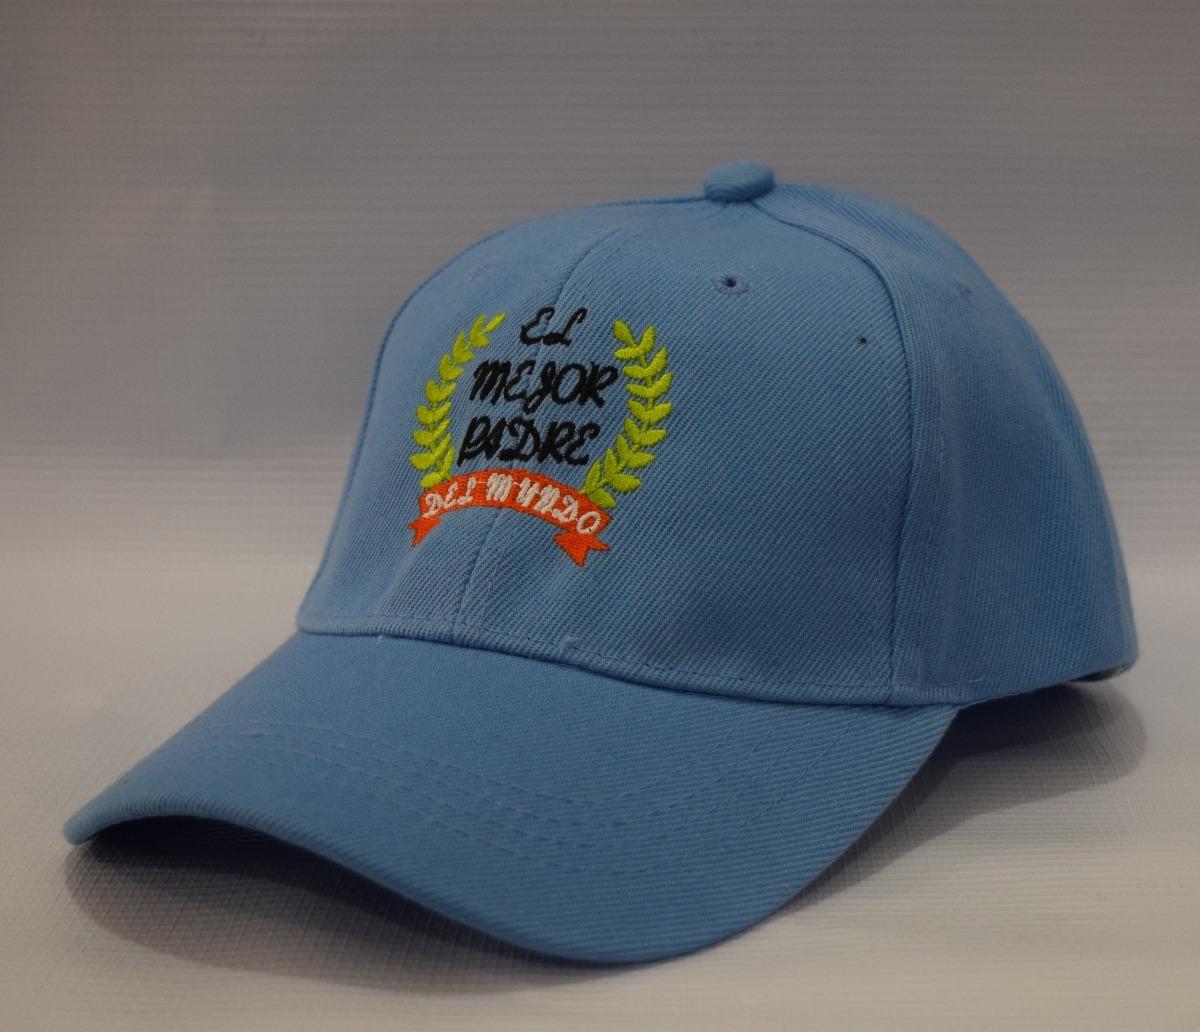 Gorras personalizadas bordadas dia del padre o papa cargando zoom jpg  1200x1032 Metalico gorras personalizadas bordadas 4c67ab00f49